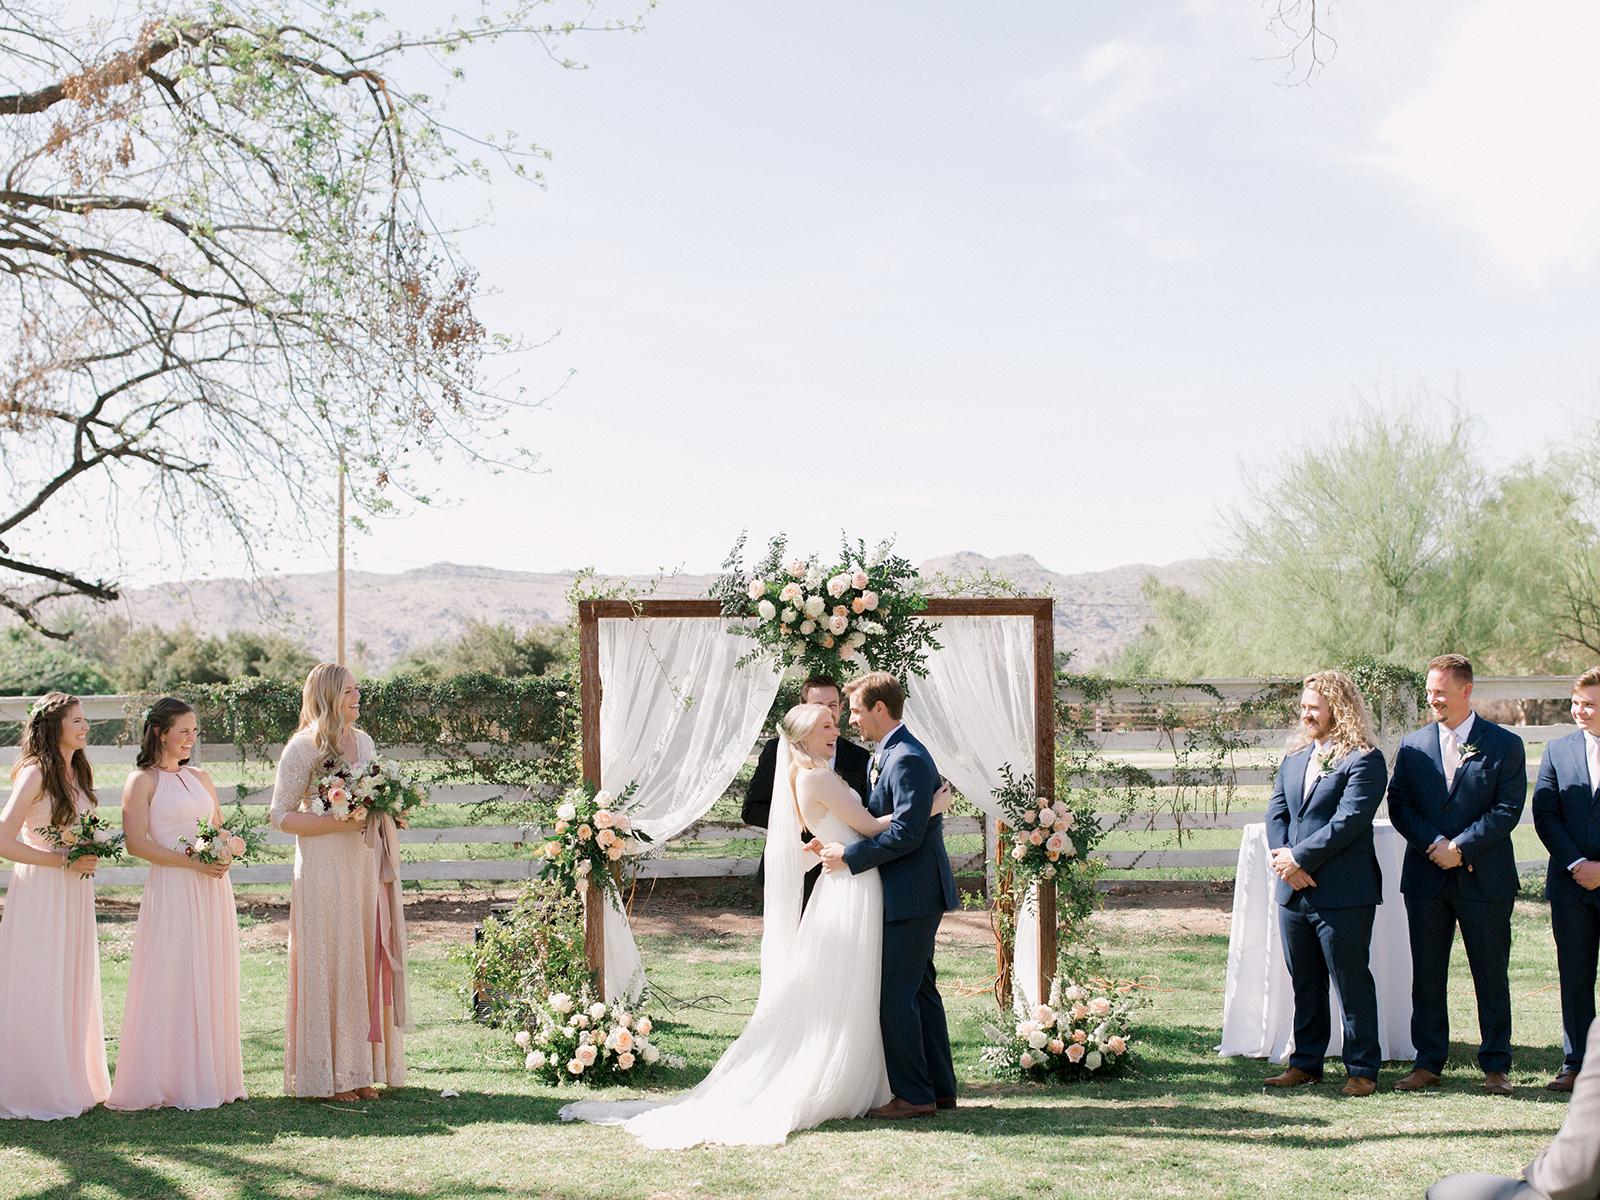 Lukas Wedding - Ceremony-168.jpg